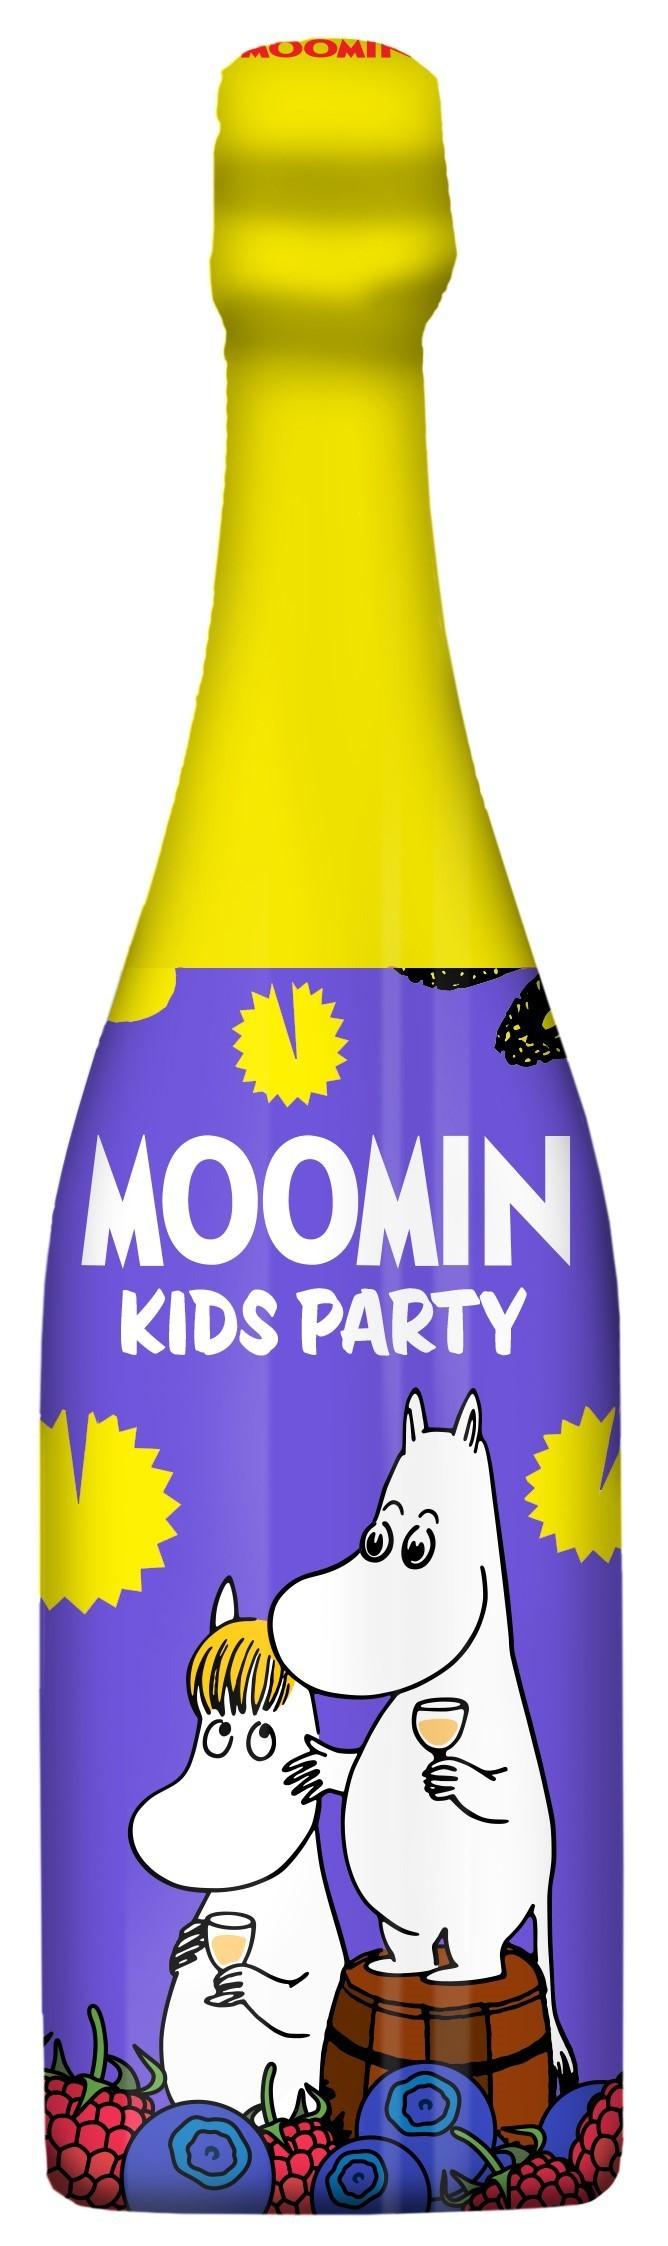 LASSO DRINKS Moomin Kids Party Drink Bilberry-Raspberry 75 cl